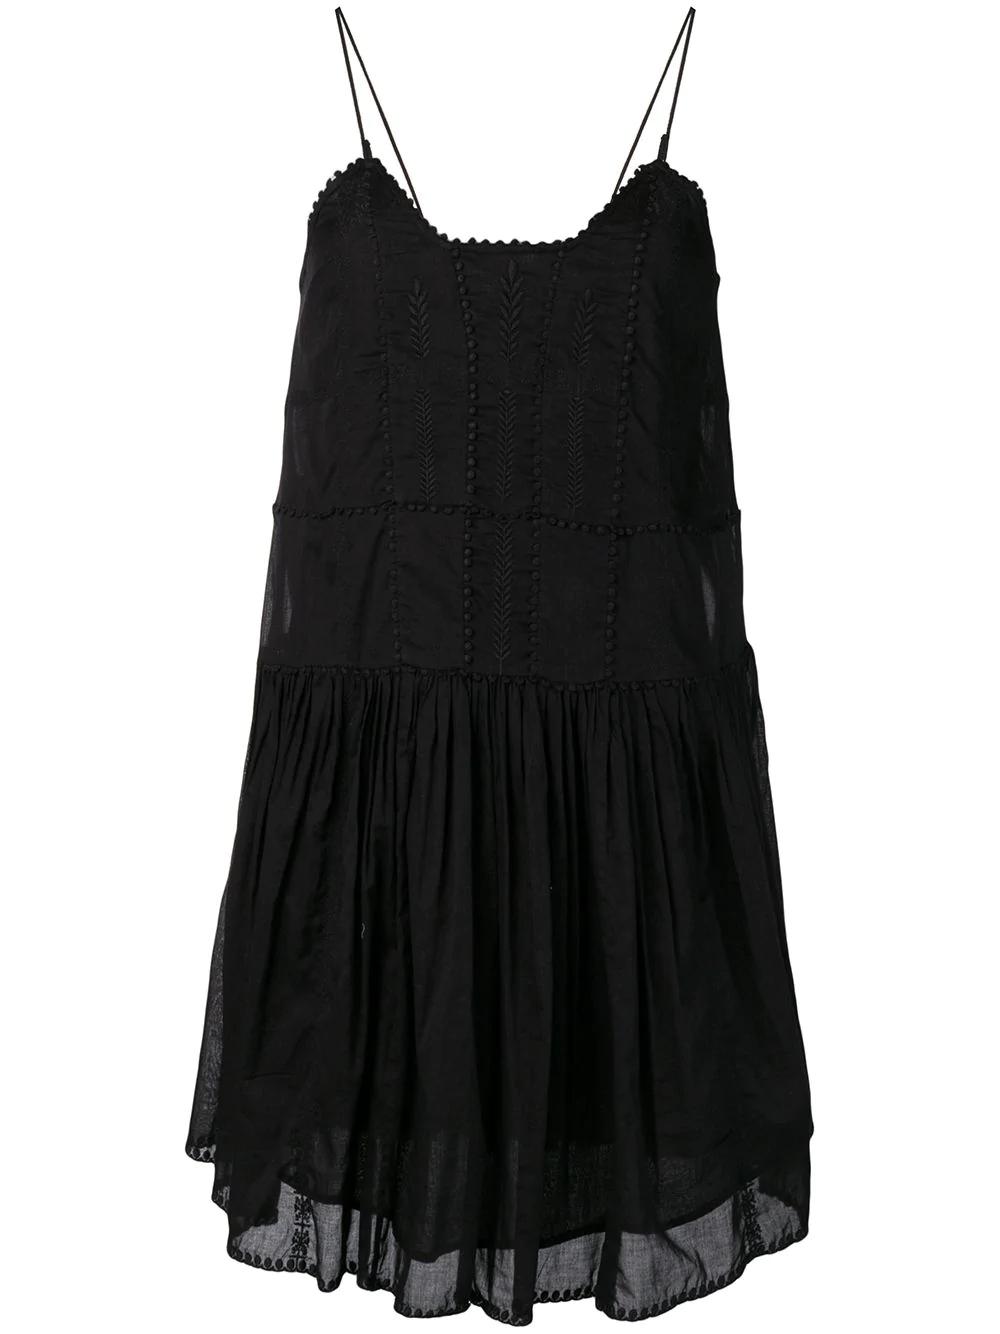 5fd2400dcbe Etoile Isabel Marant Isabel Marant ÉToile Amelie Dress - Black ...